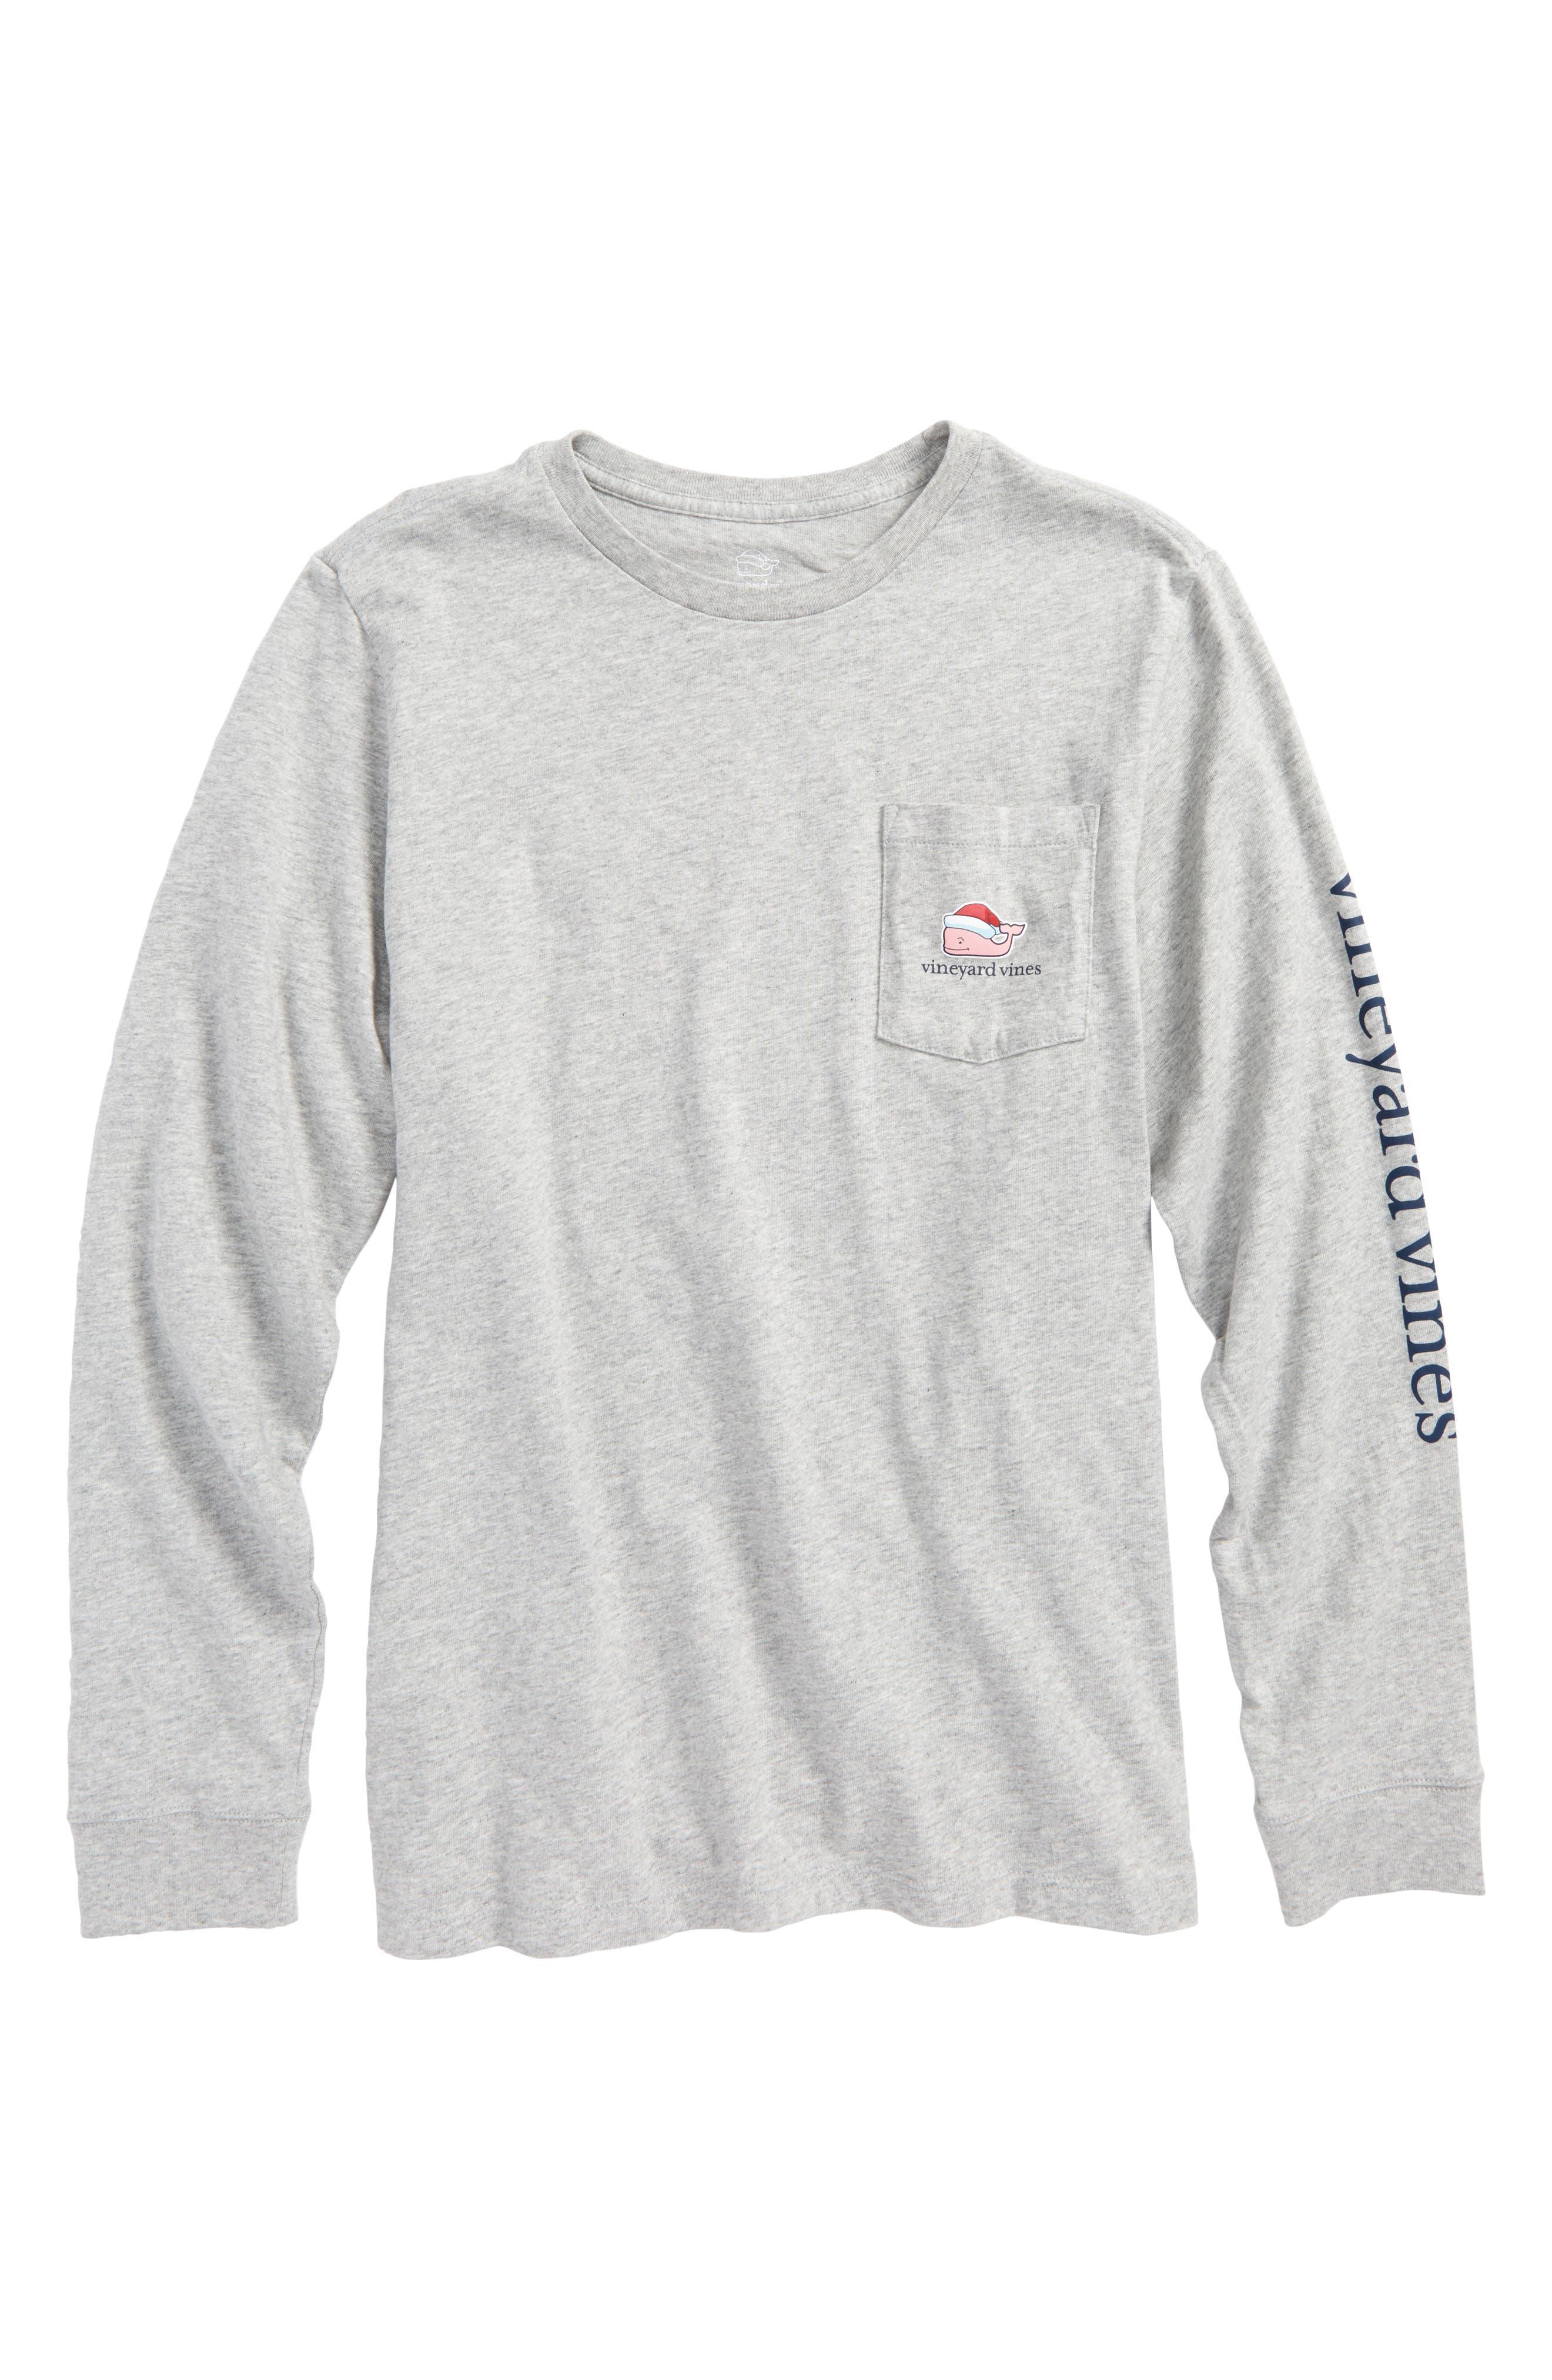 Santa Whale Happy Holidays 2017 T-Shirt,                         Main,                         color, 039